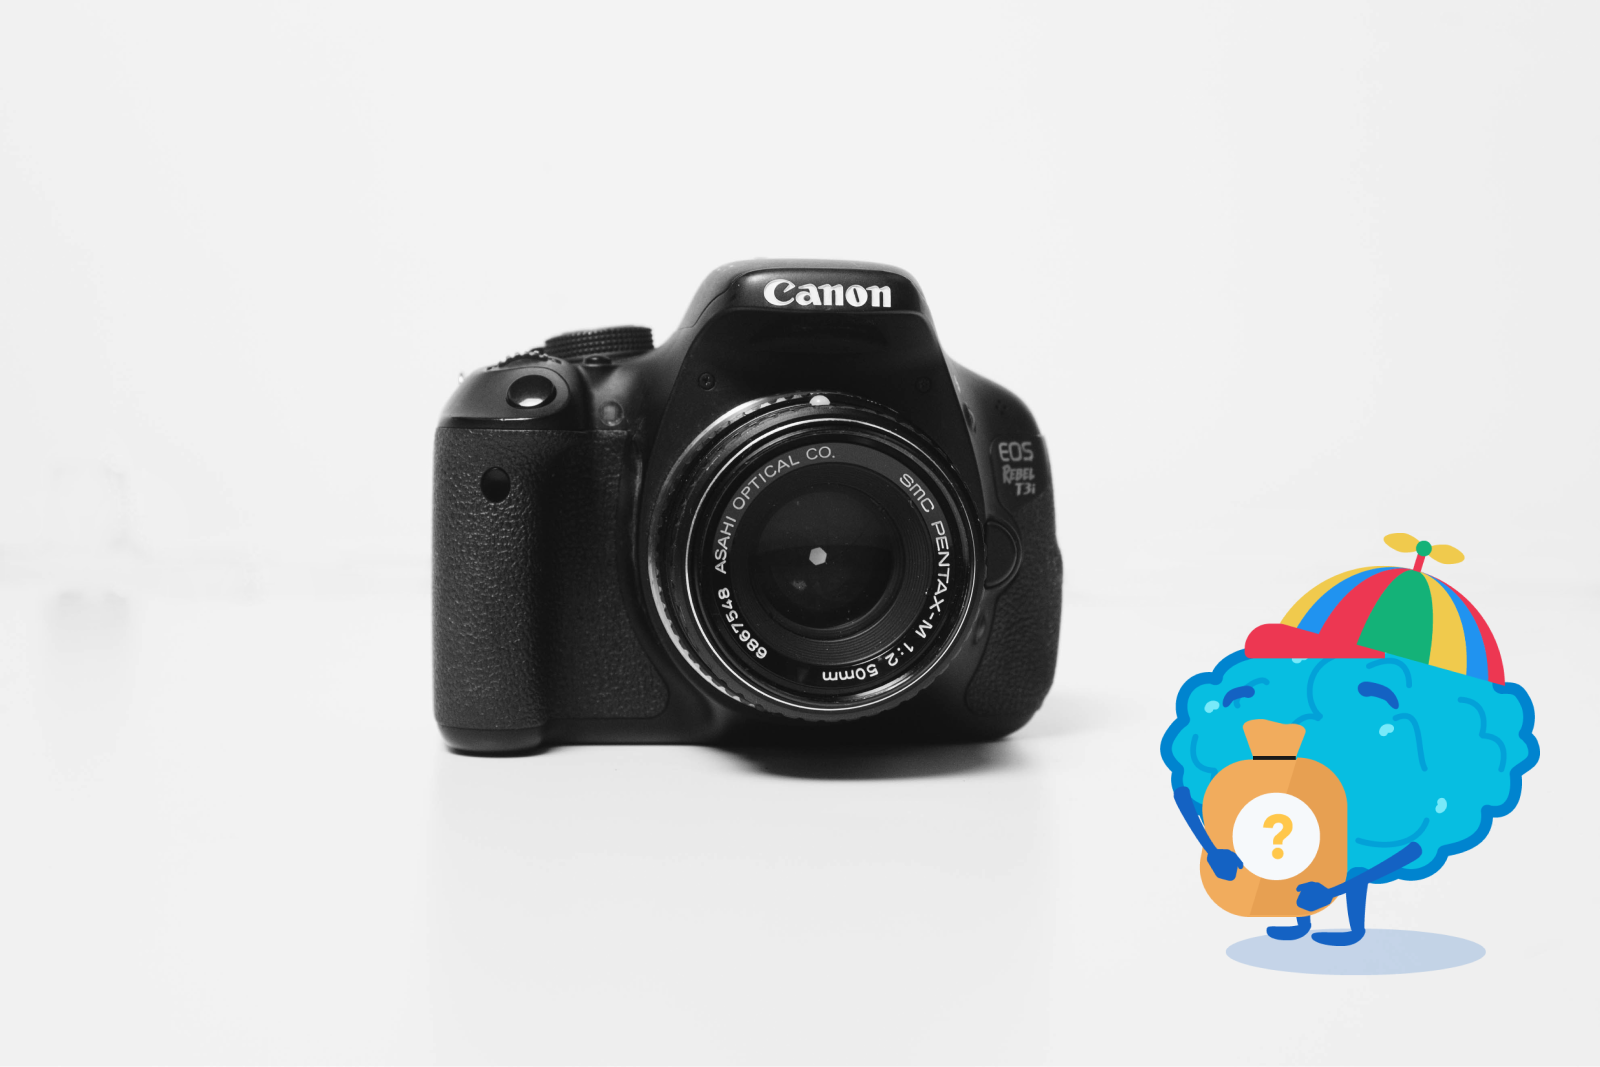 Team Building Activities - Camera